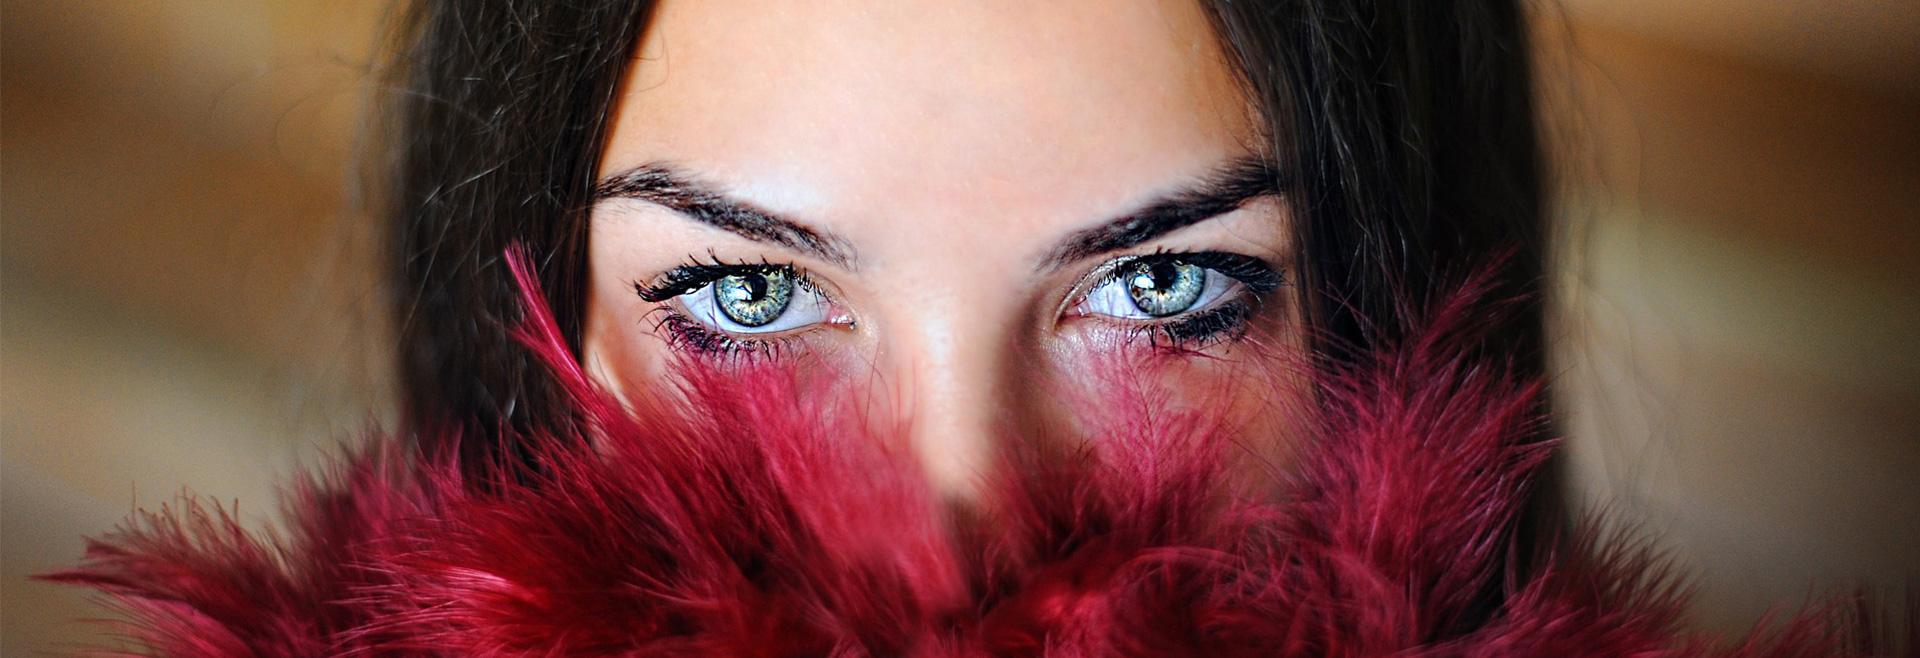 Makeup and lash treatments Eccleston